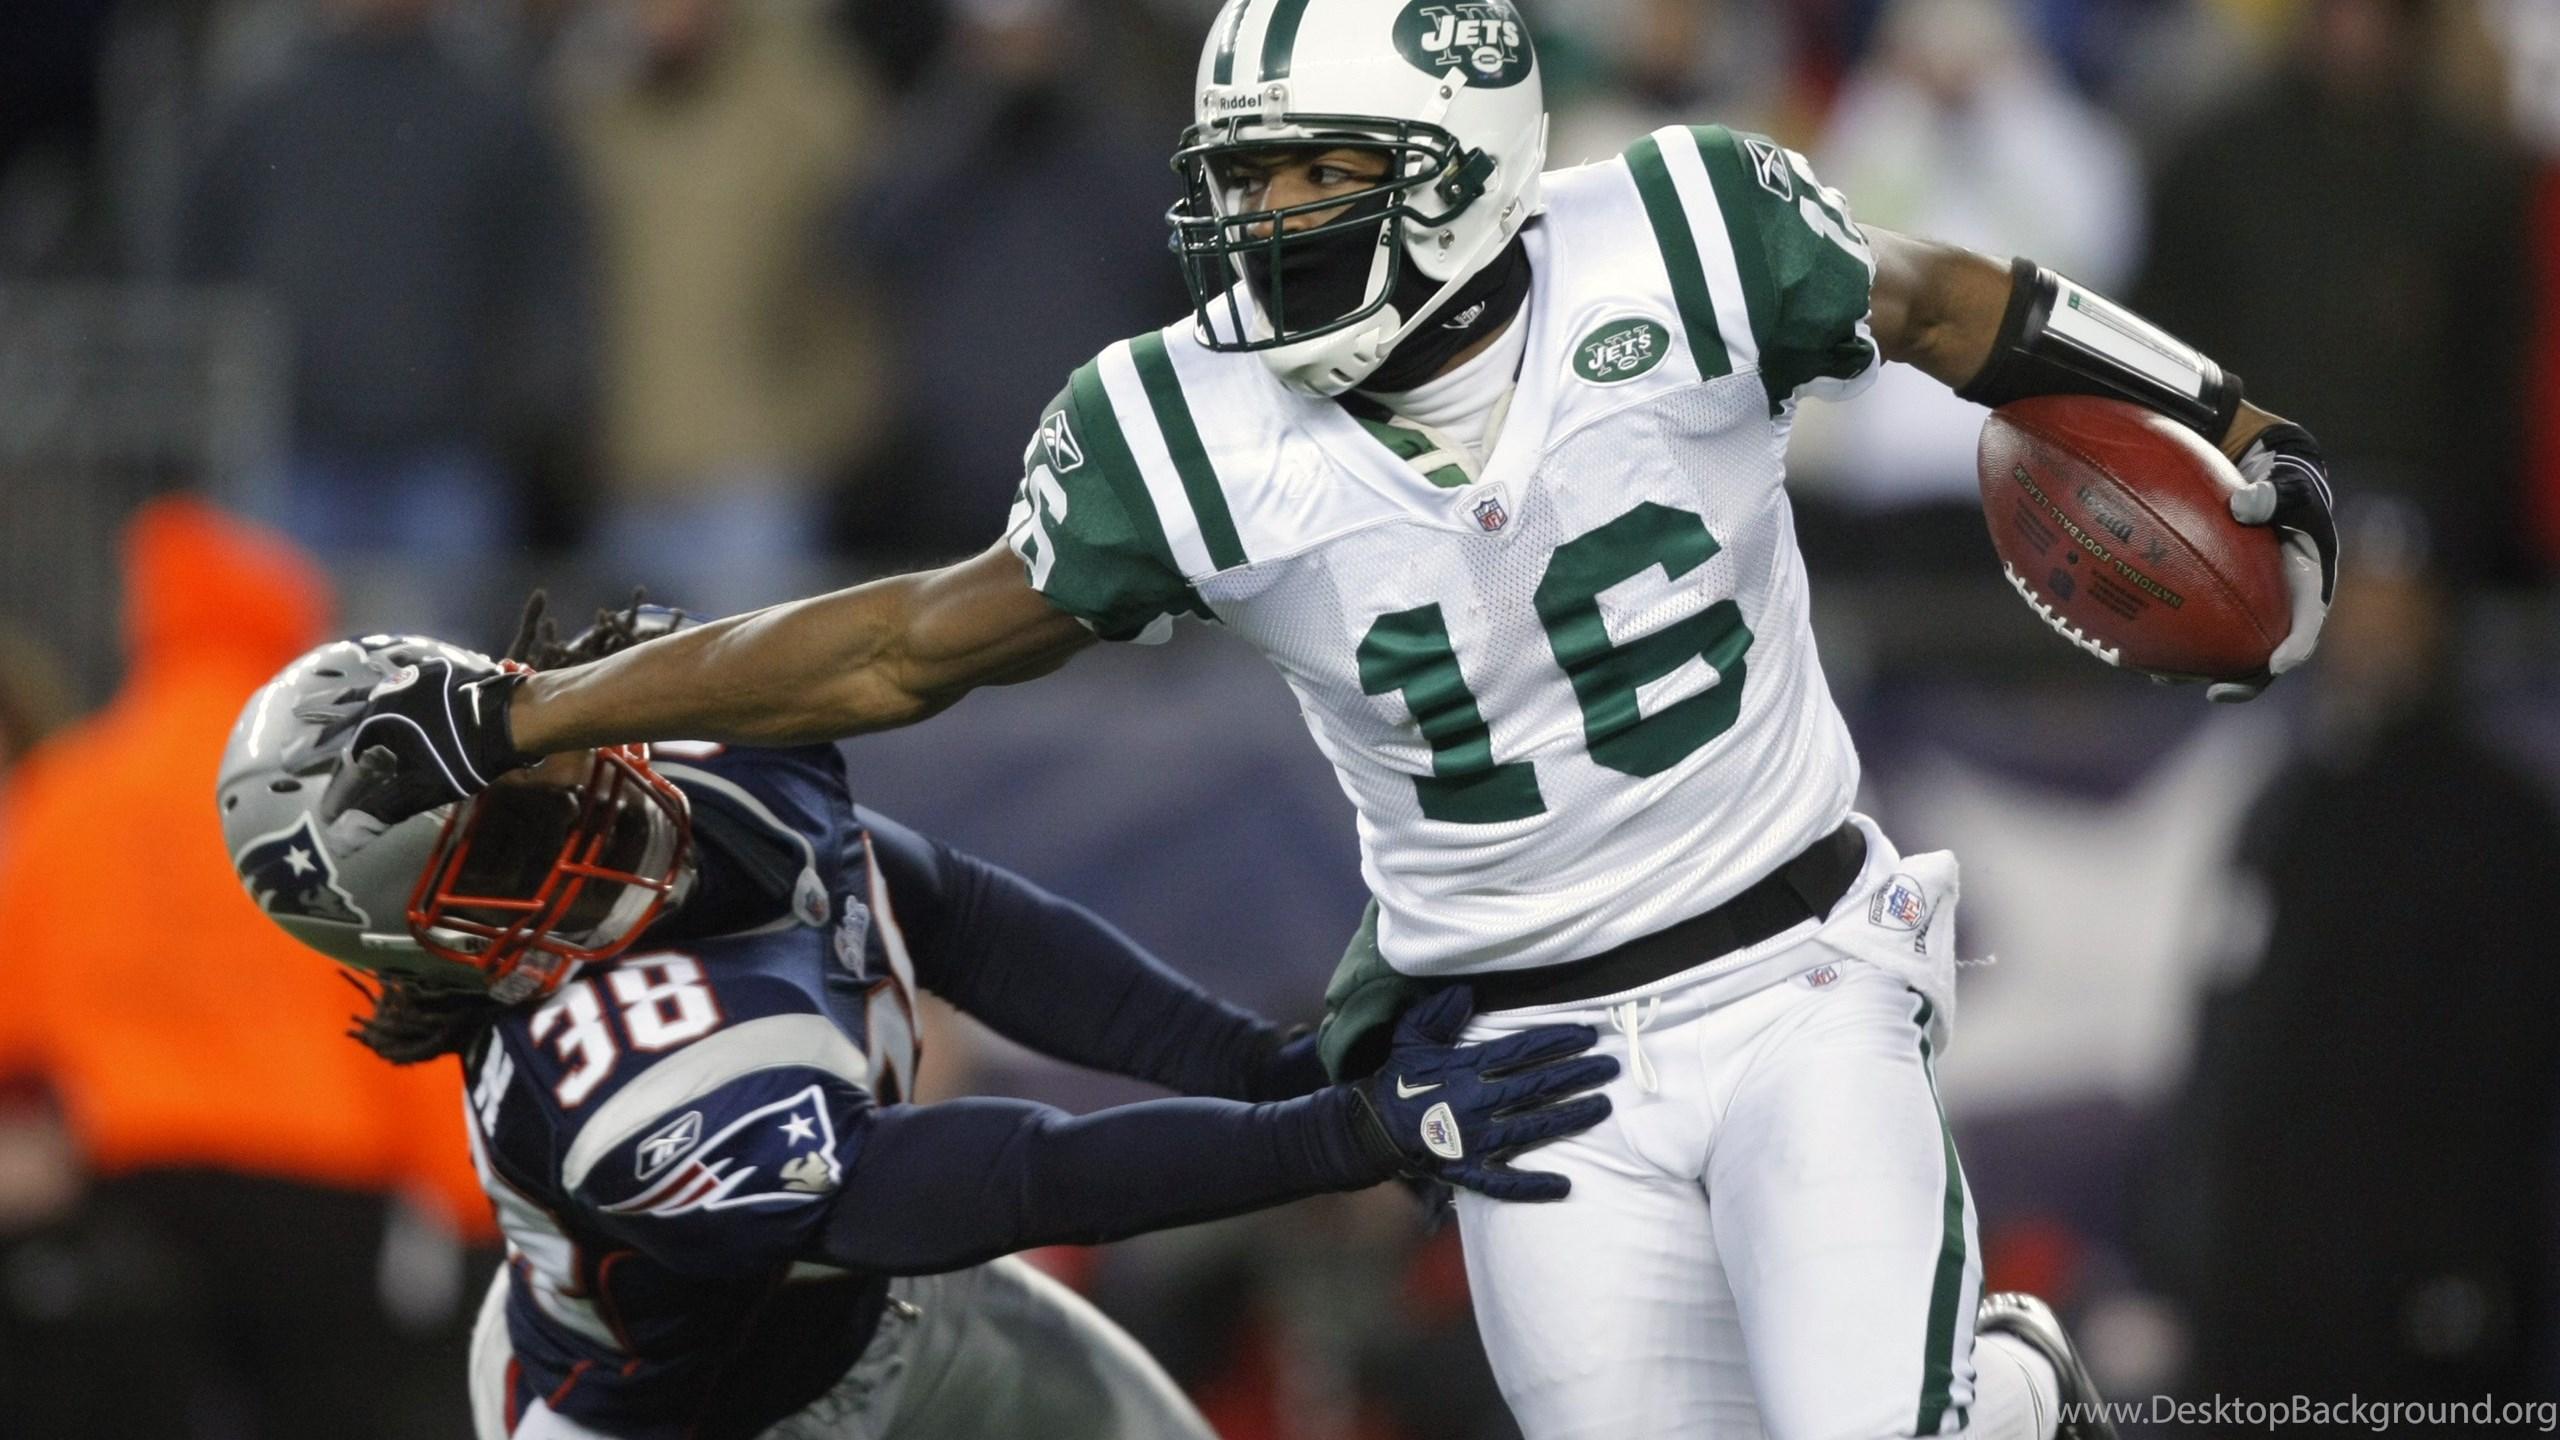 New York Jets Nfl Football R Wallpapers Desktop Background